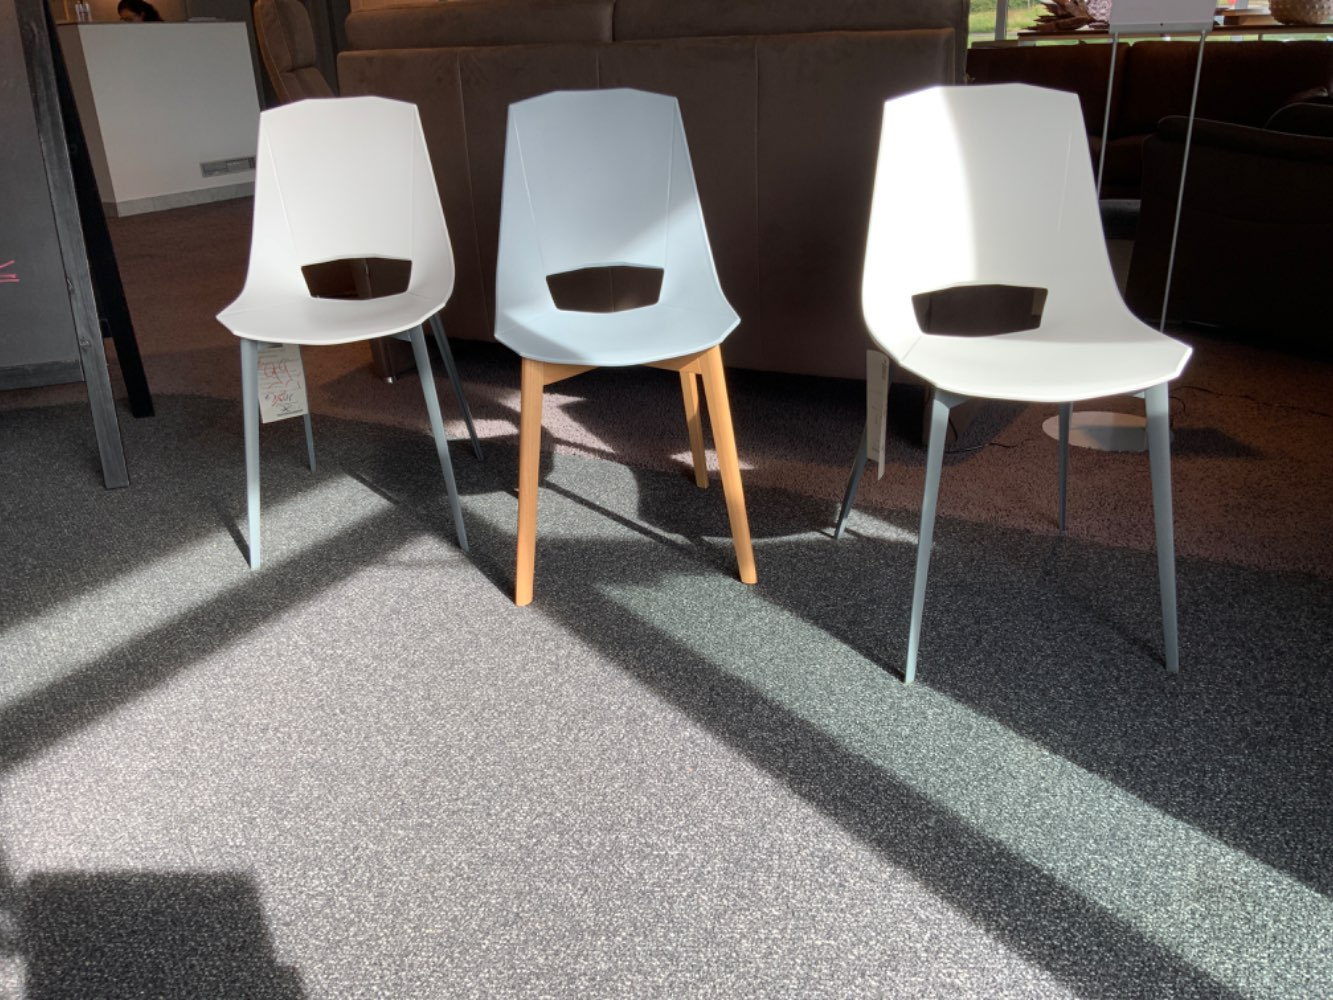 Stuhl RaumFreunde Oda Kunststoffschale abwischbar weiß der grau Gestell Metall oder Eiche